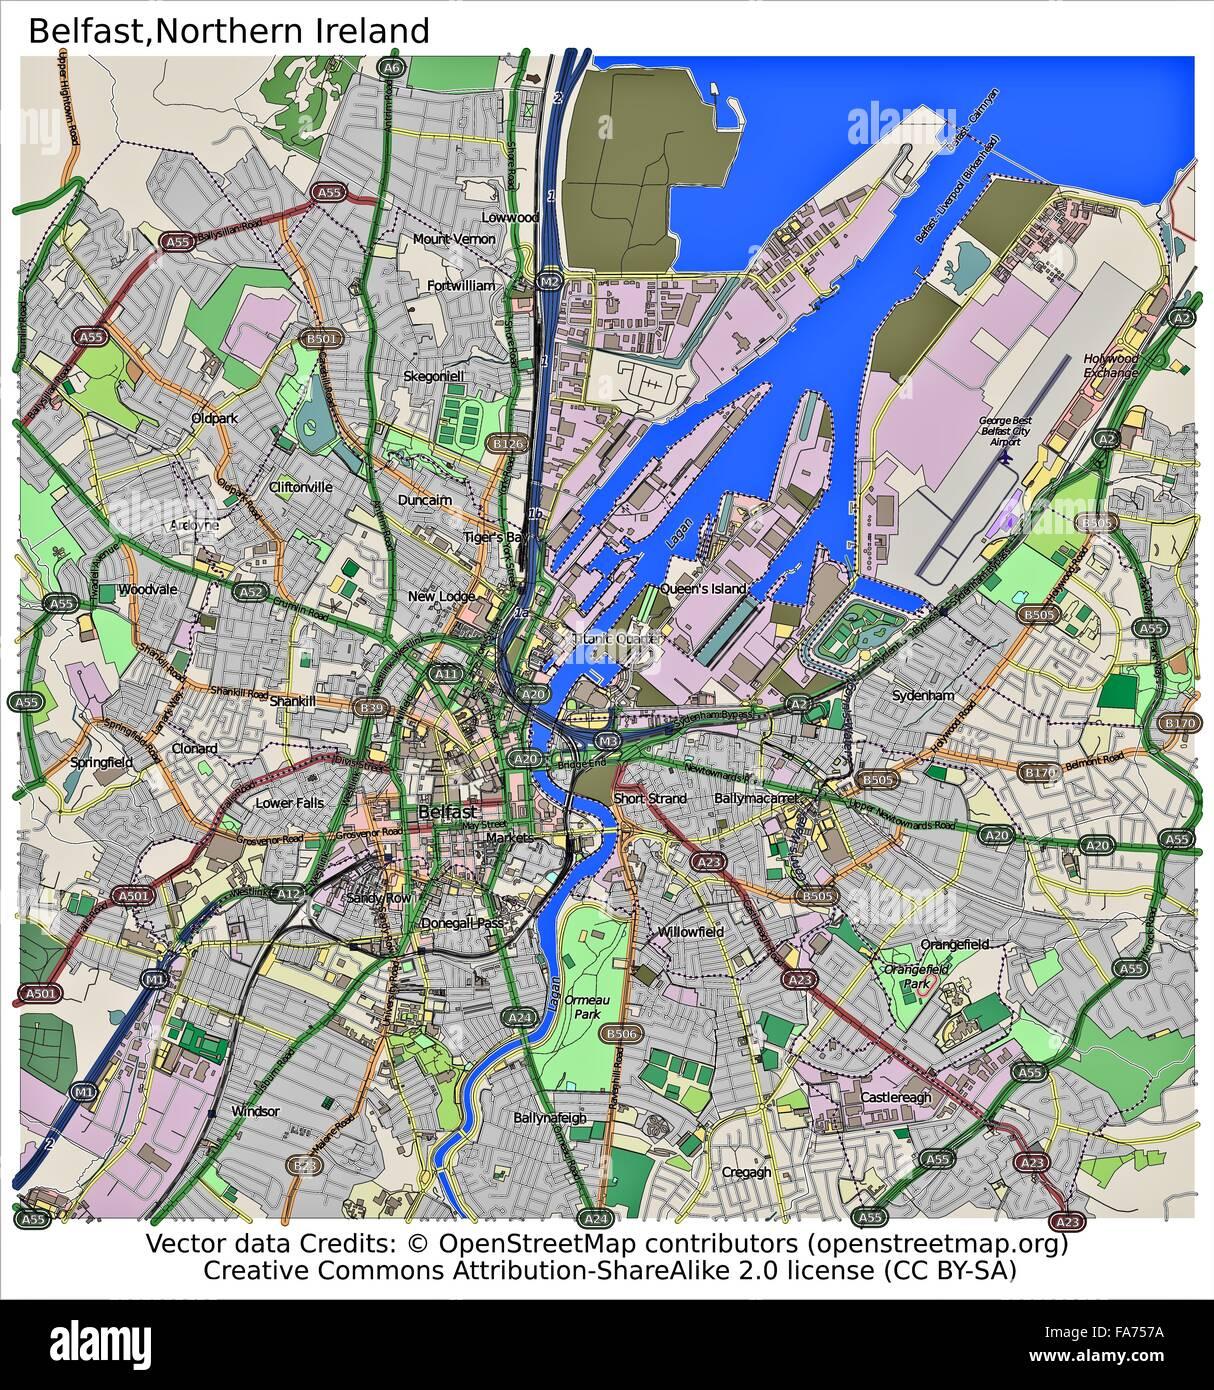 Belfast Northern Ireland location map Stock Photo: 92356190 - Alamy